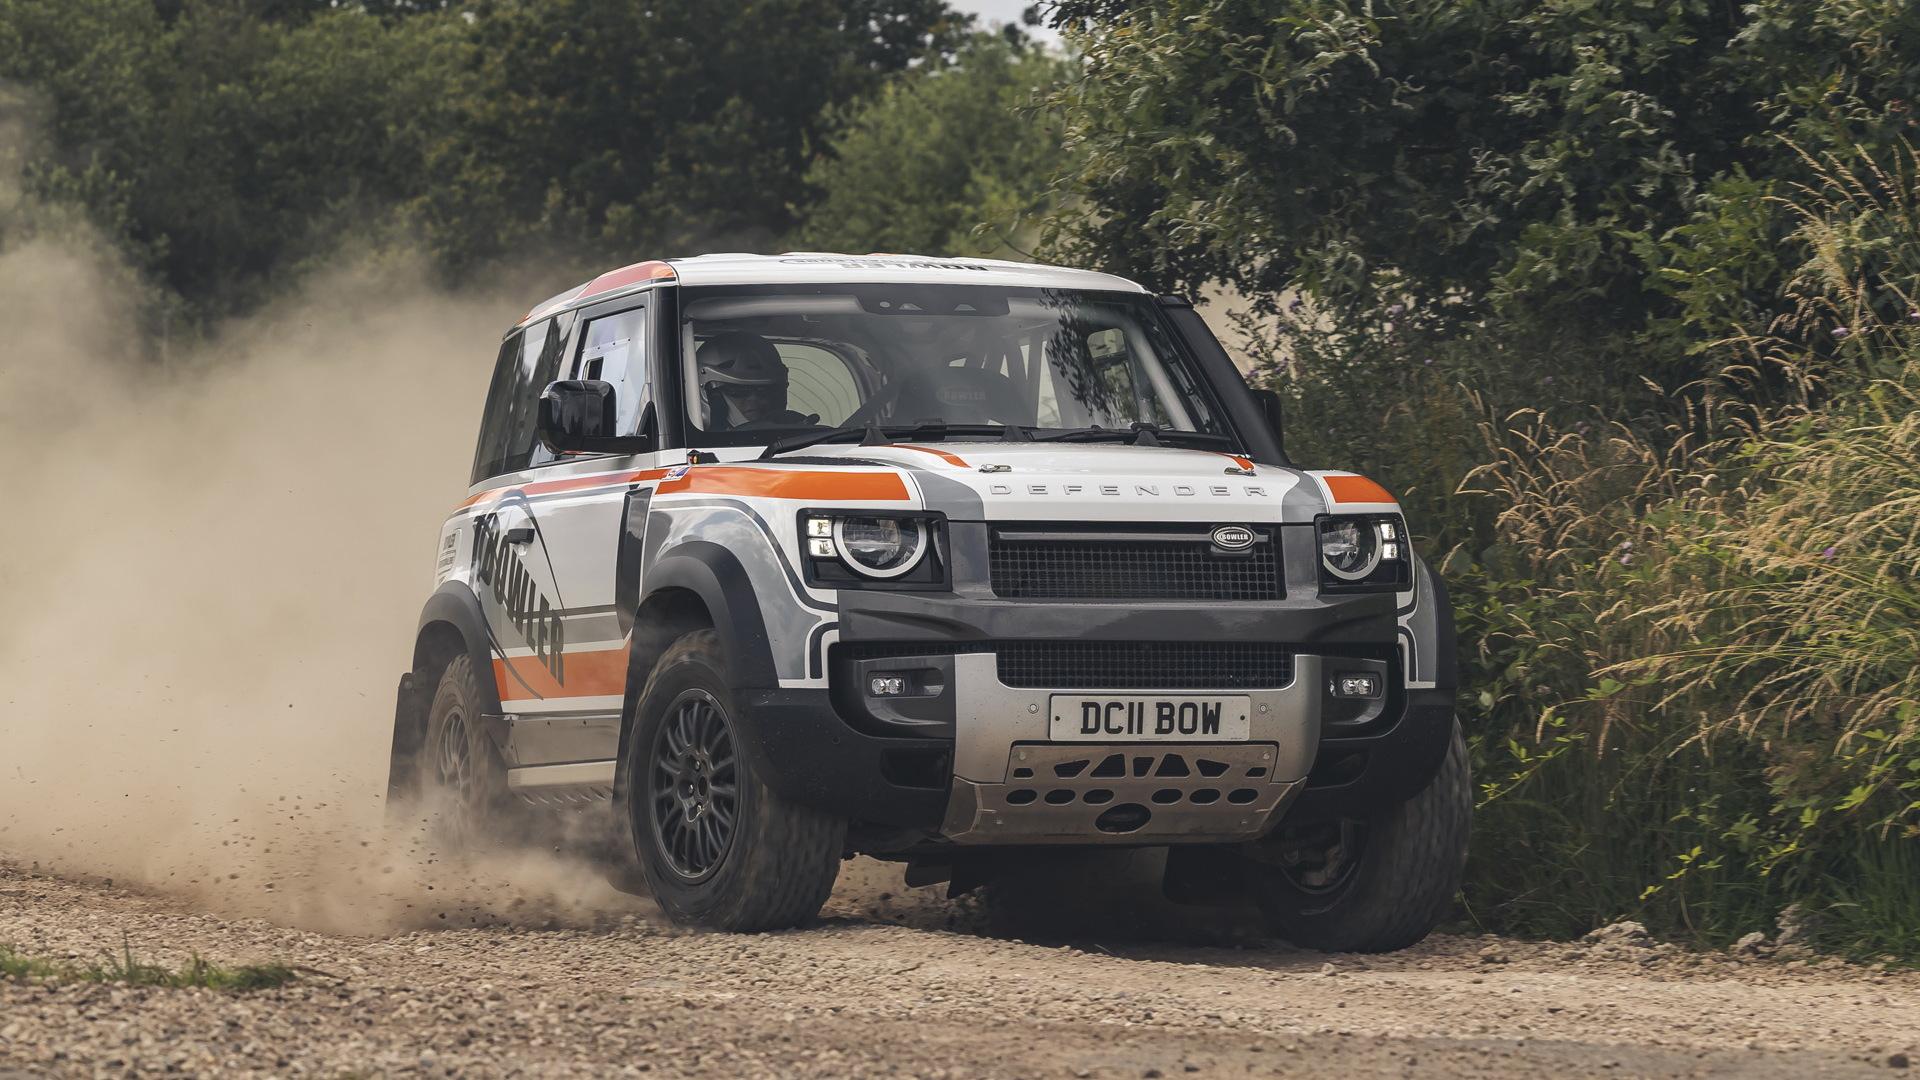 2022 Bowler Defender Challenge rally car